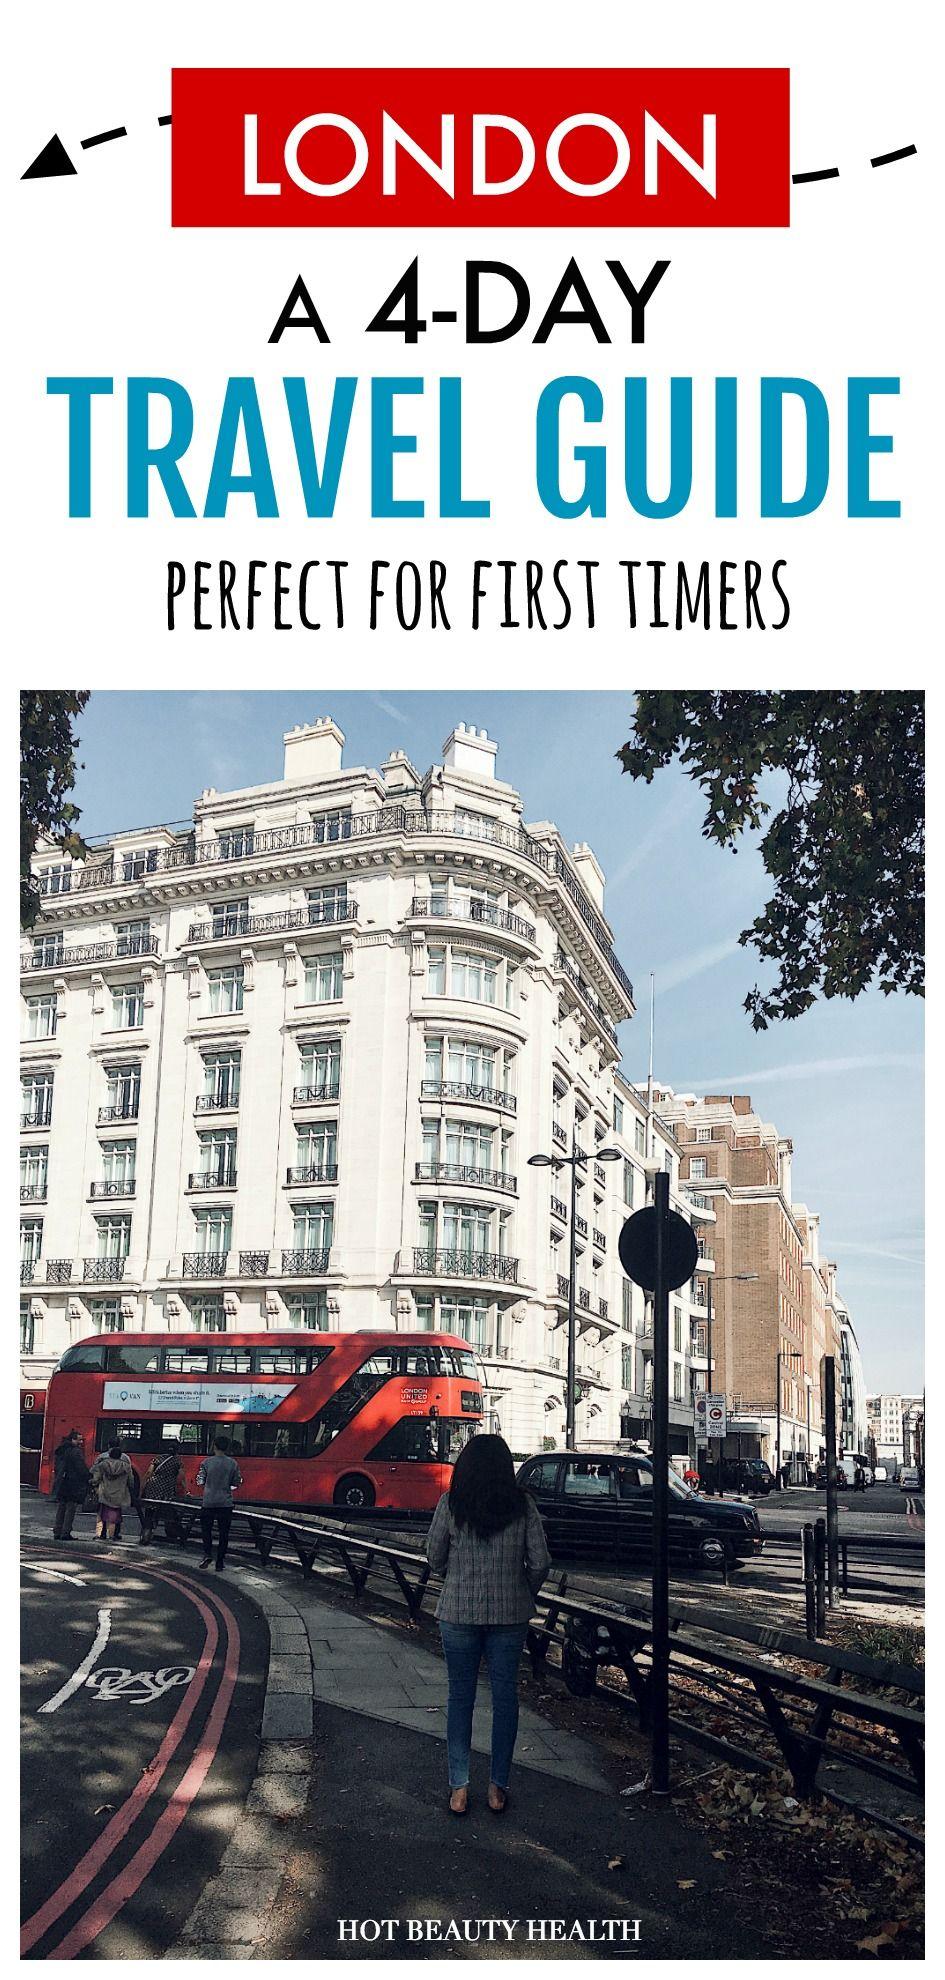 Travel companion london